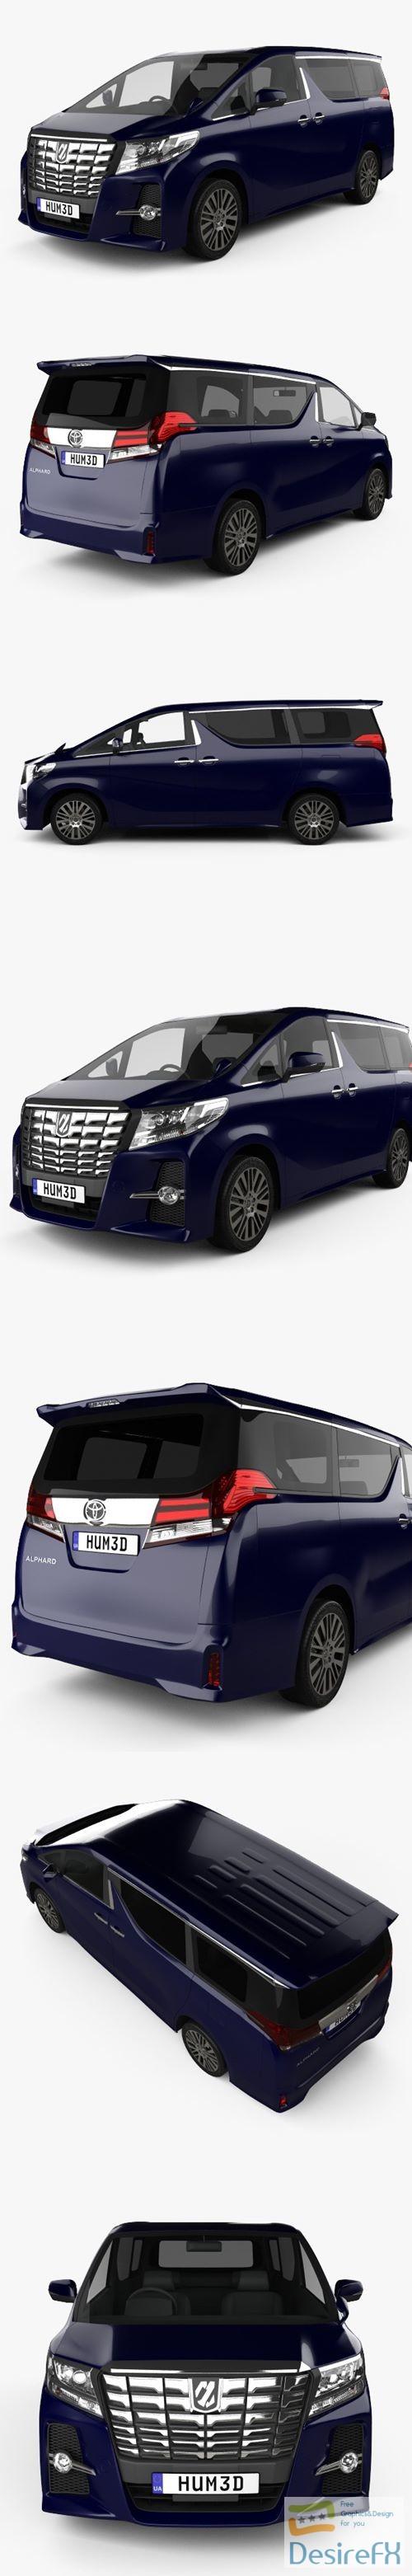 3d-models - Toyota Alphard 2015 3D Model